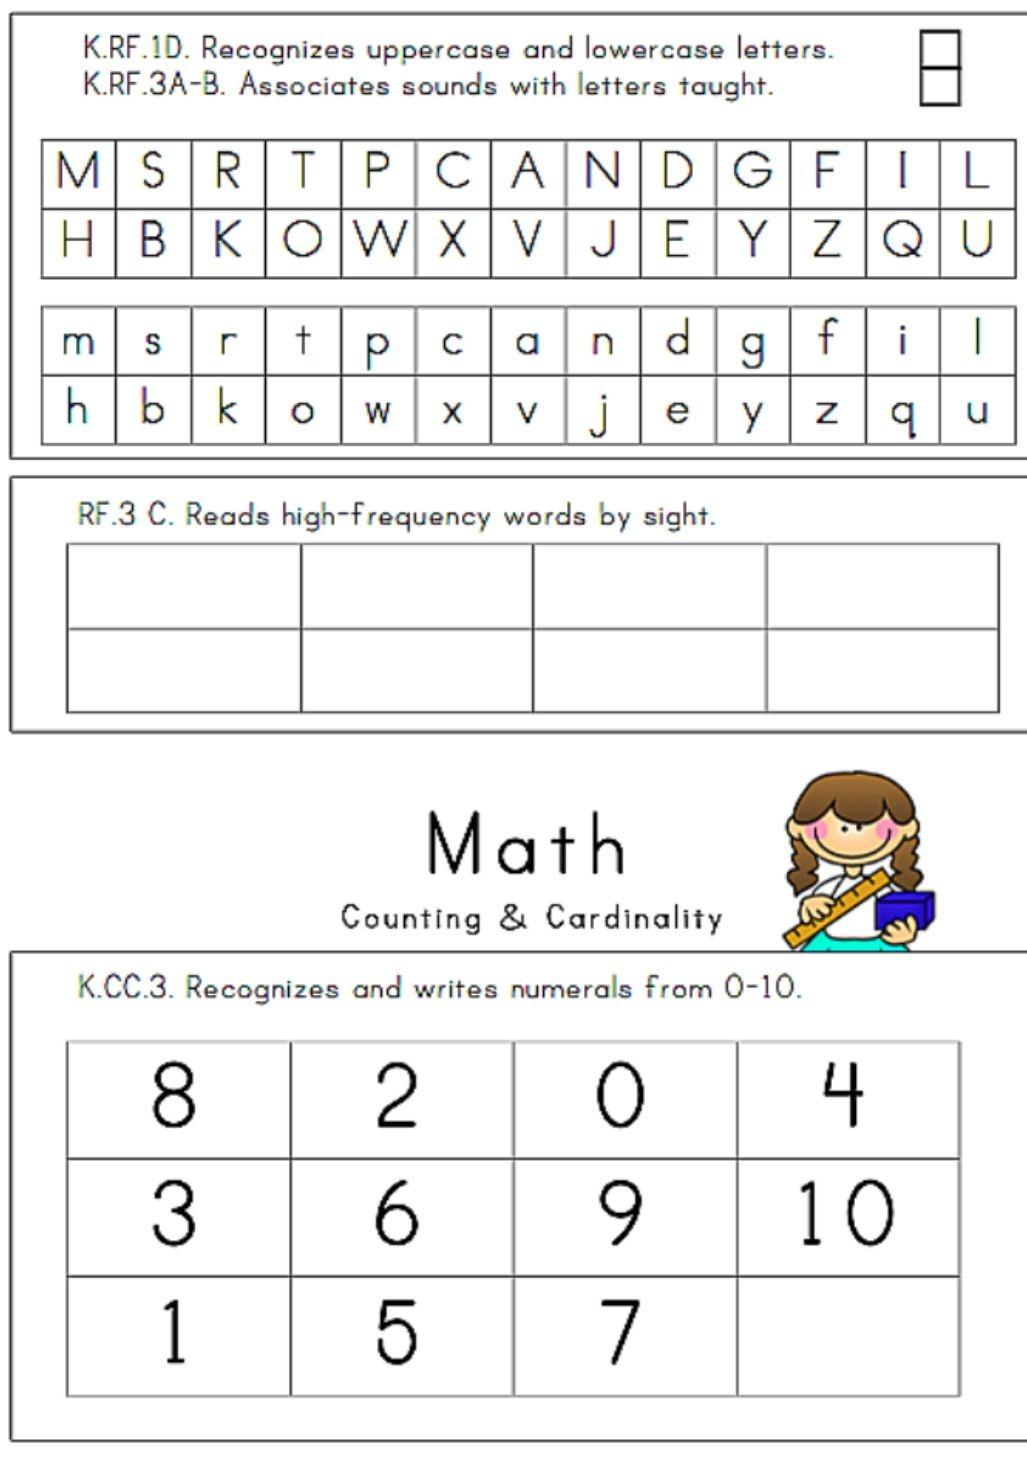 24 Page, Illustrated Kindergarten Assessment | Assessments - Free Printable Informal Math Assessments